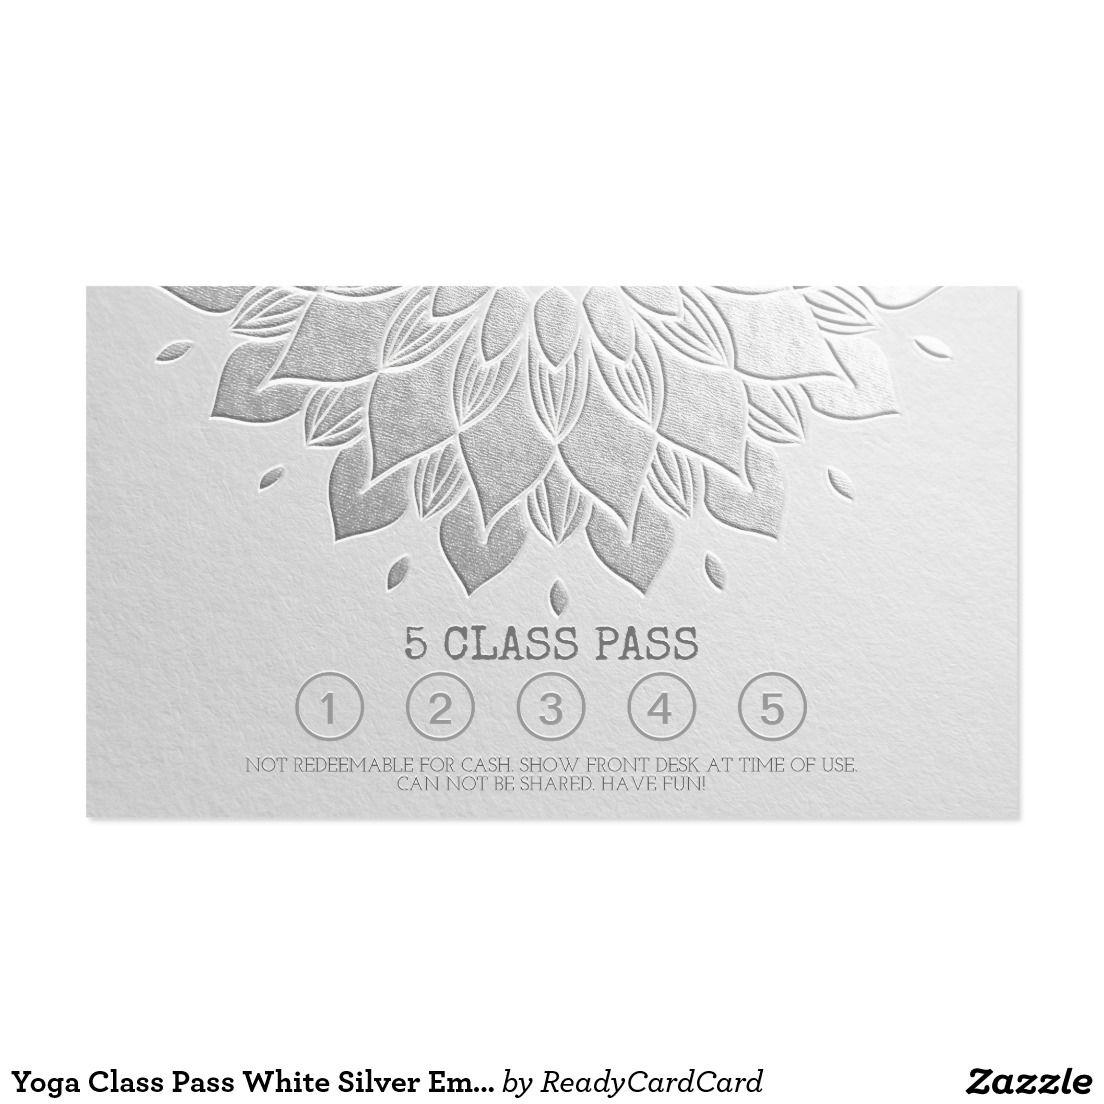 Yoga Class Pass White Silver Emboss Mandala Floral Business Card ...